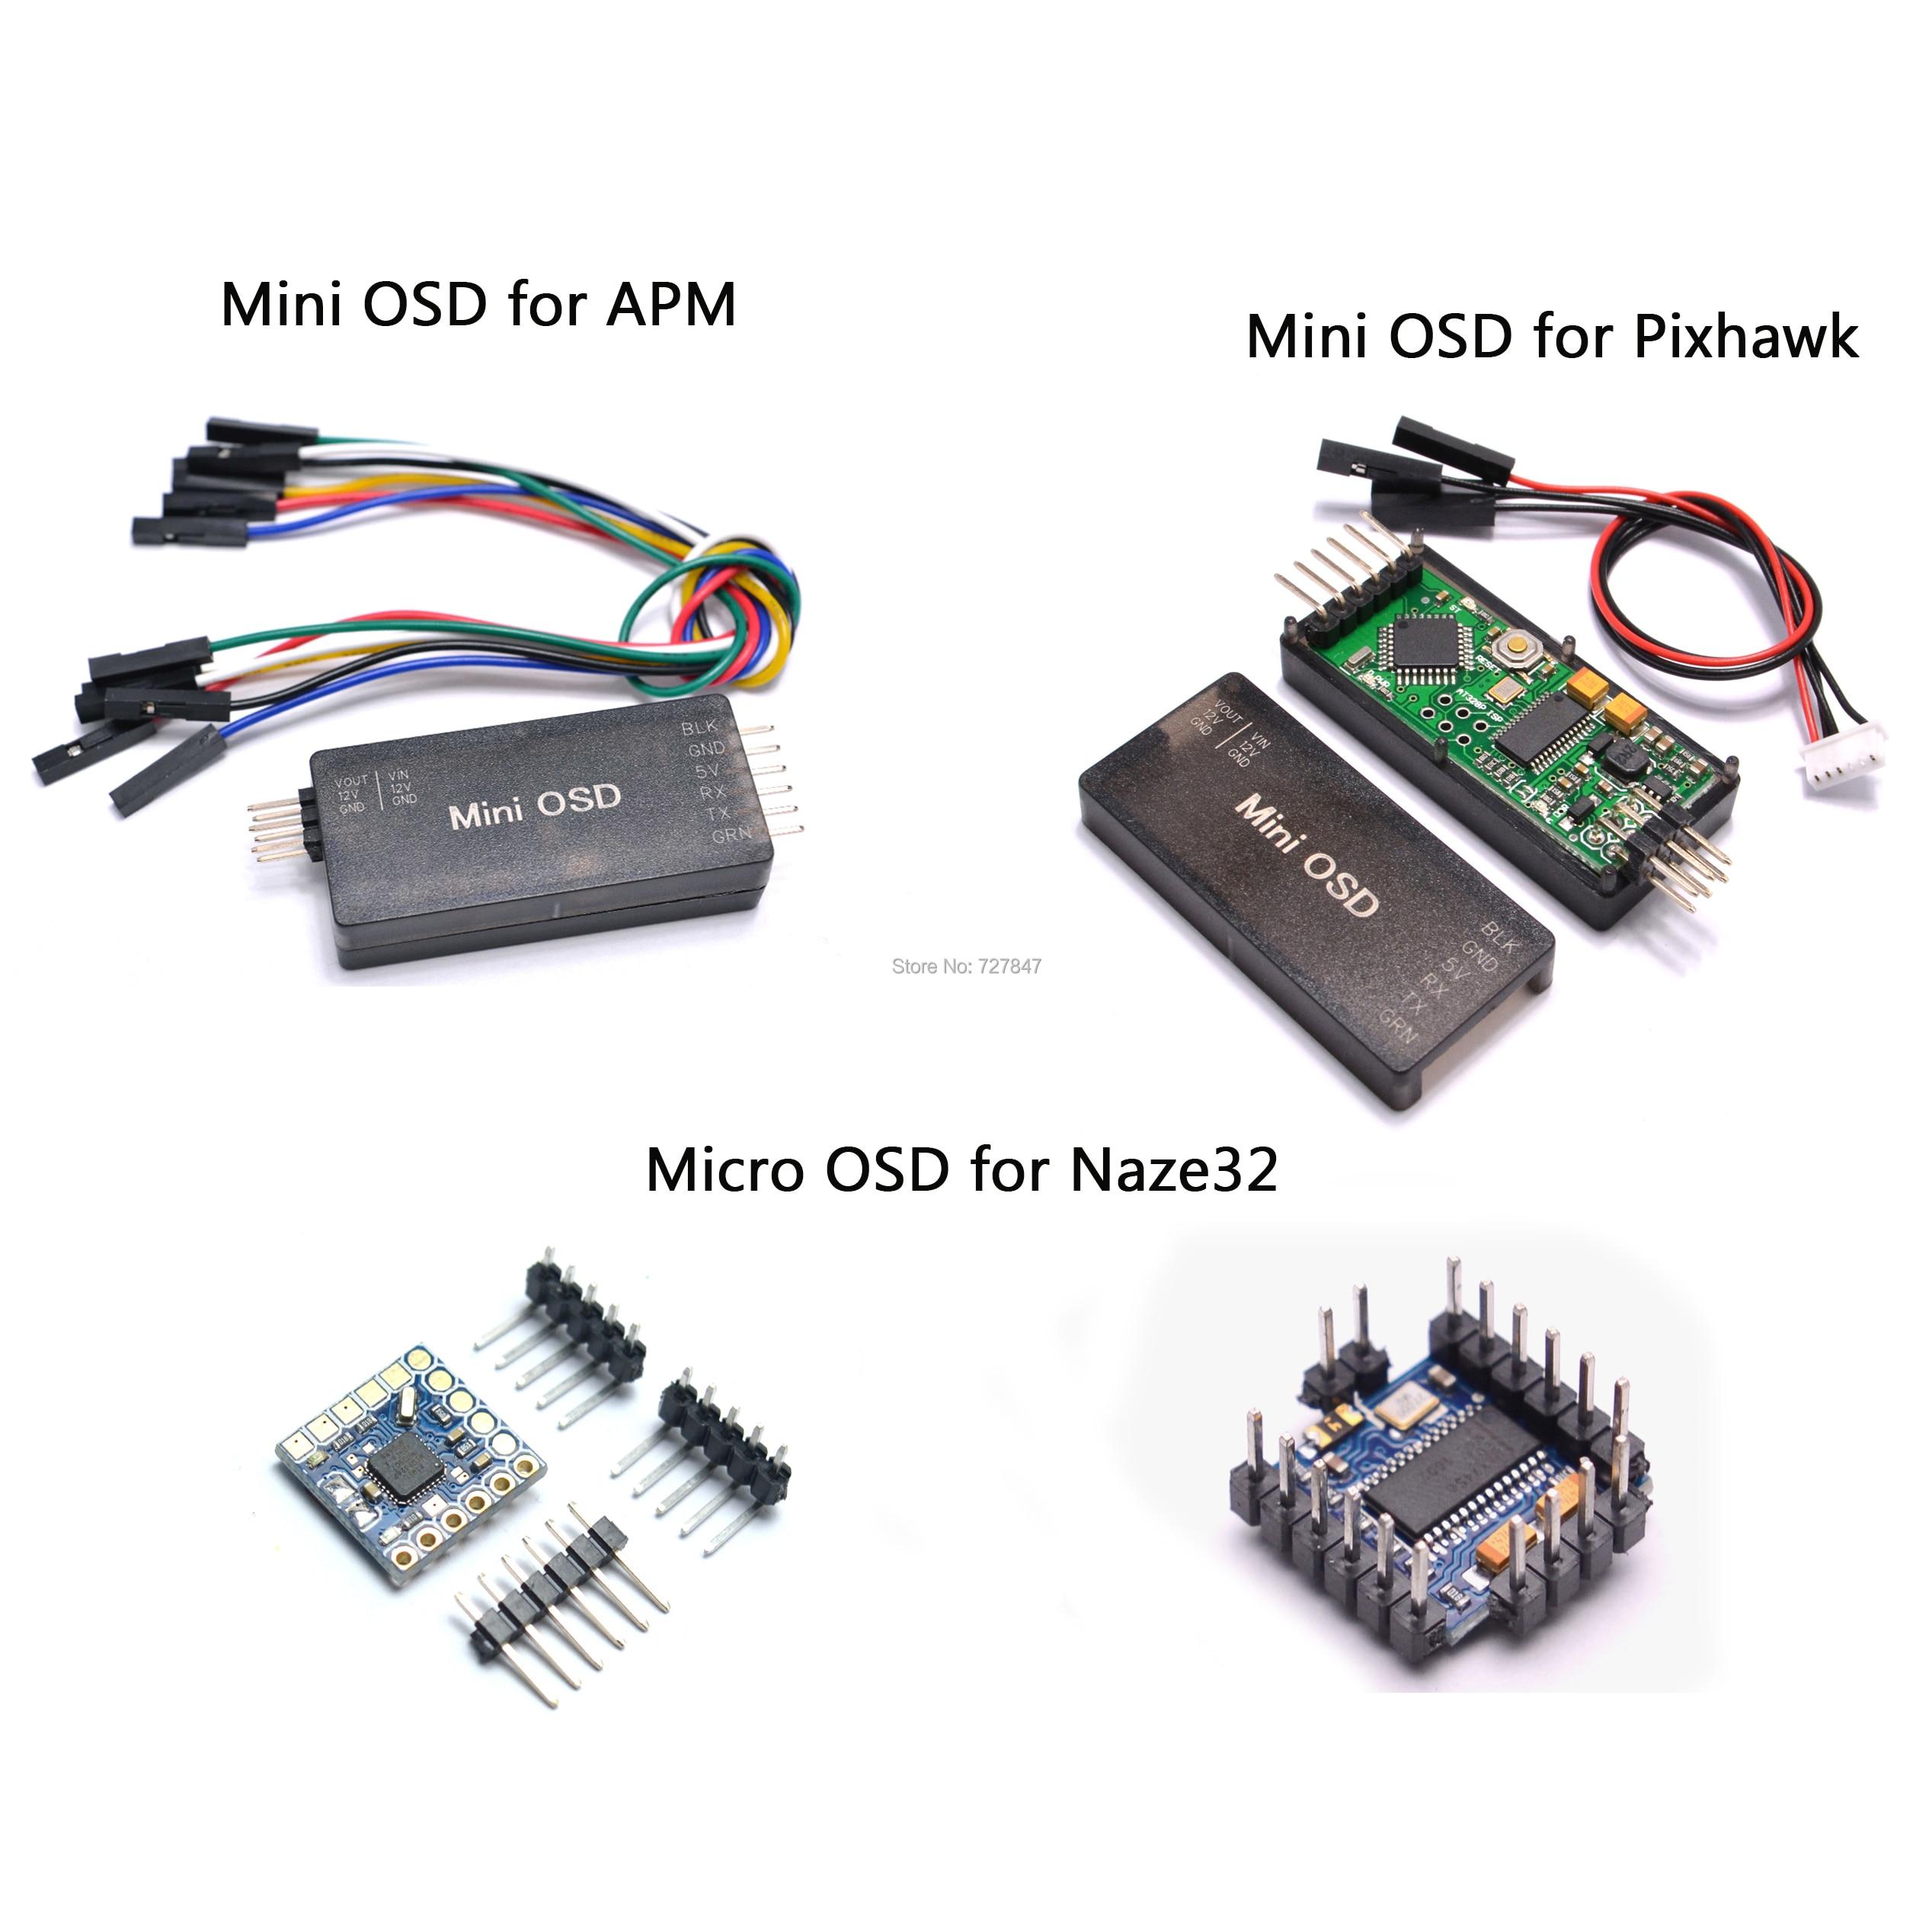 minimosd buy - MICRO MINIMOSD Minim OSD Mini OSD  For Quadcopter Multicopter APM / PIXHAWK / NAZE32 Flight Control